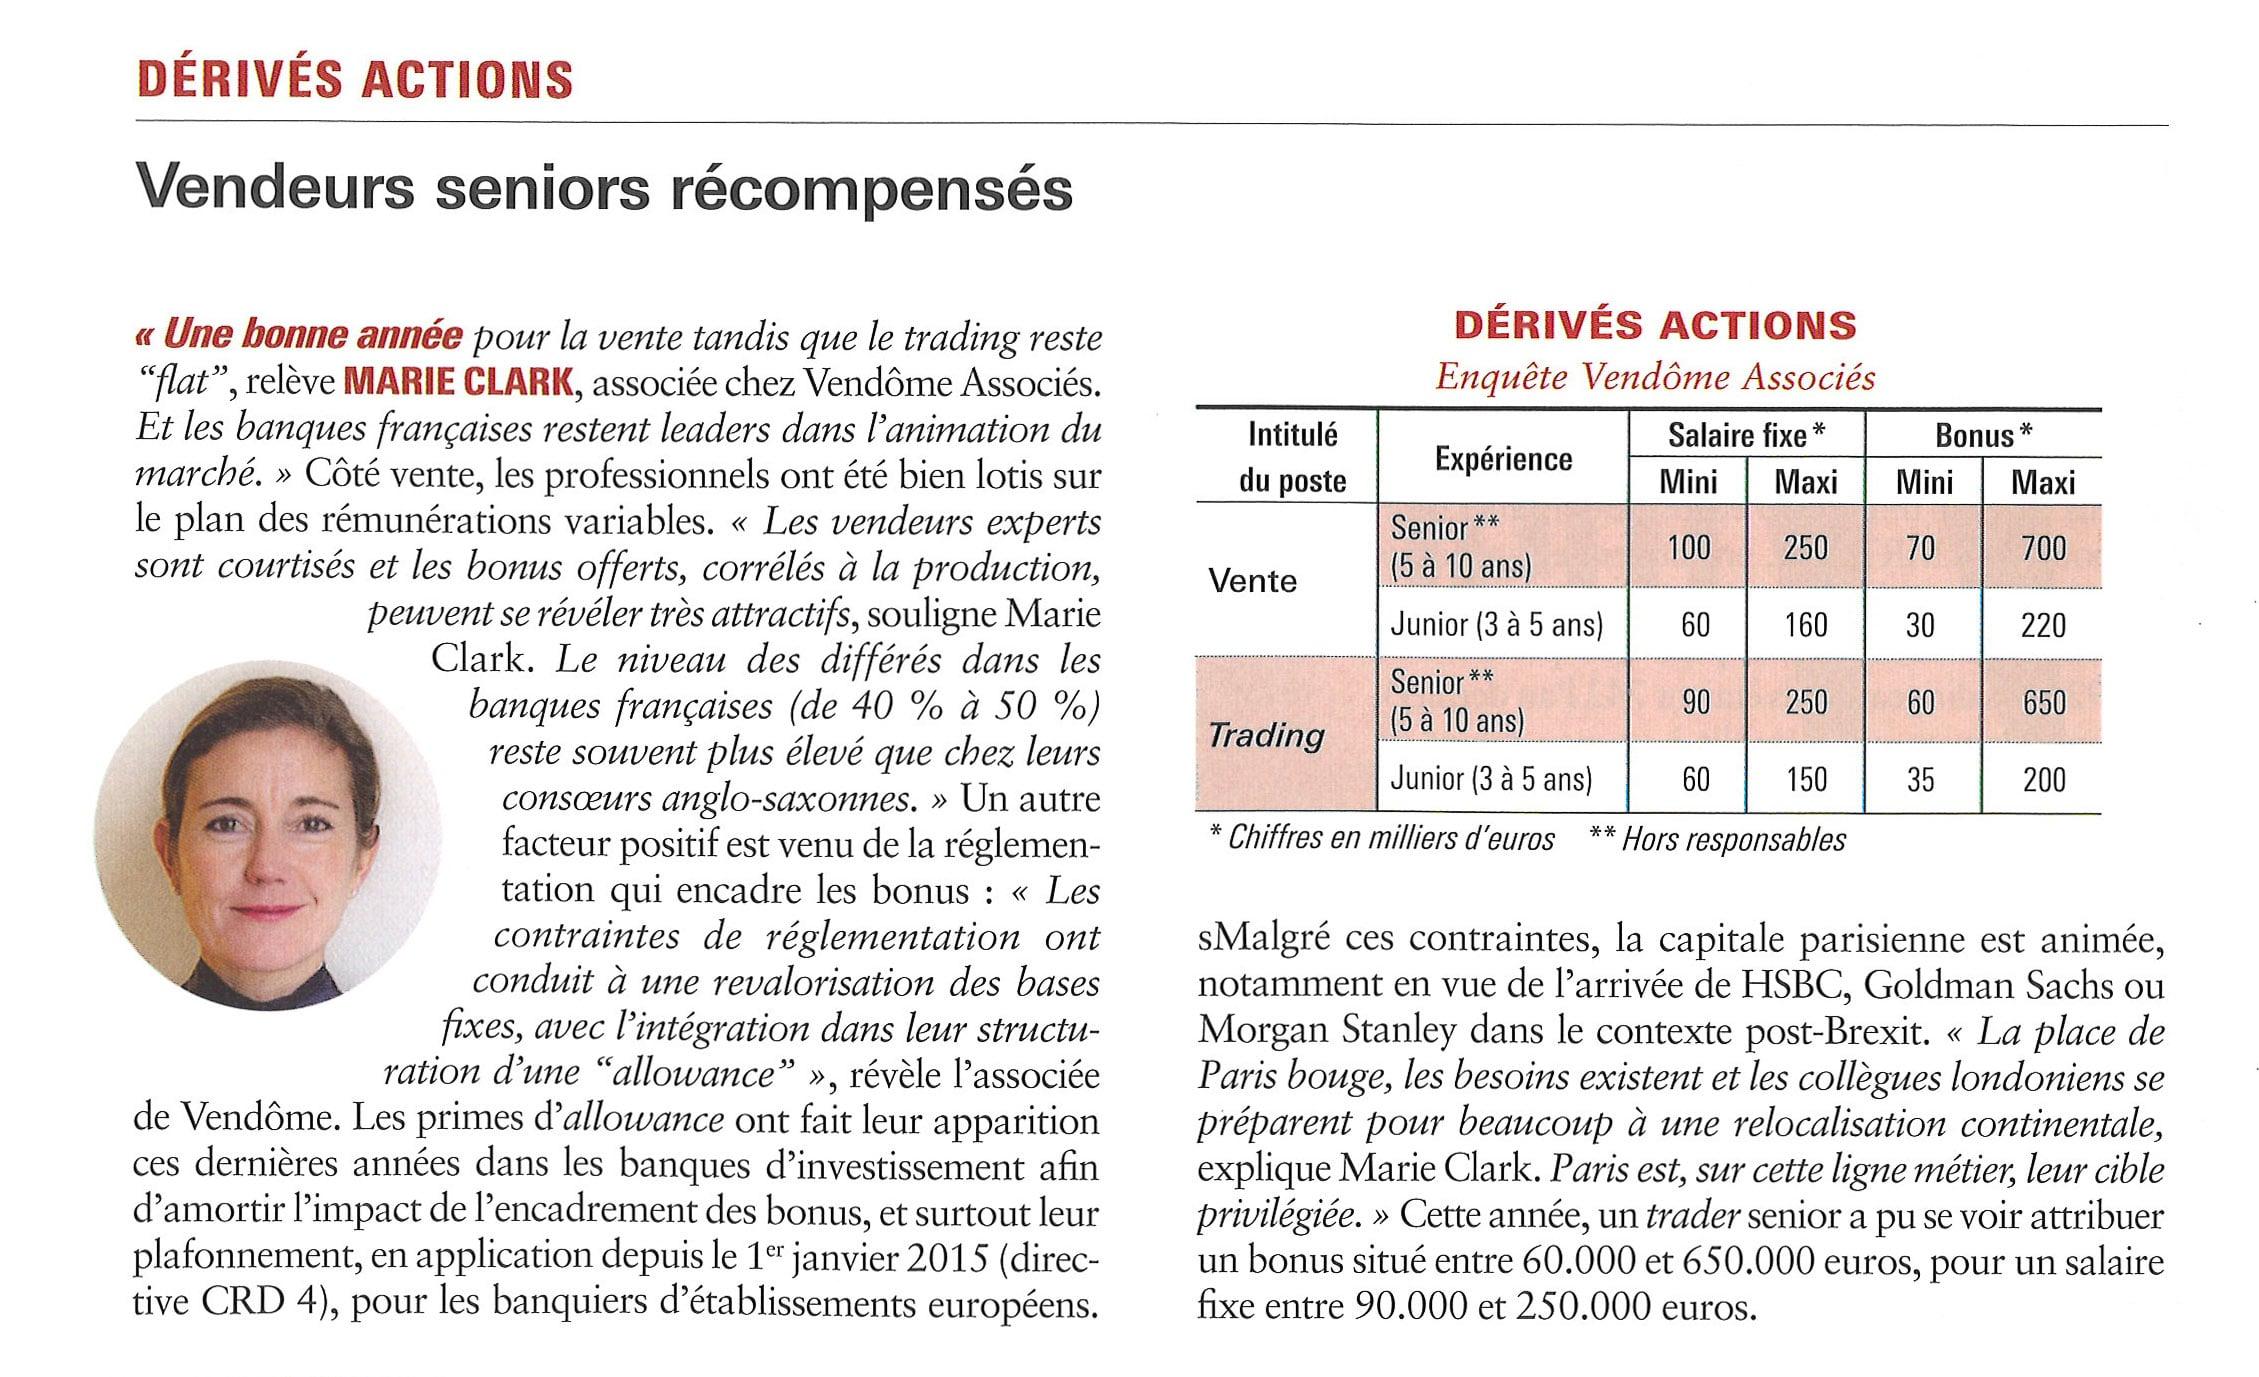 2018-AGEFI-bonus-dérivés actions